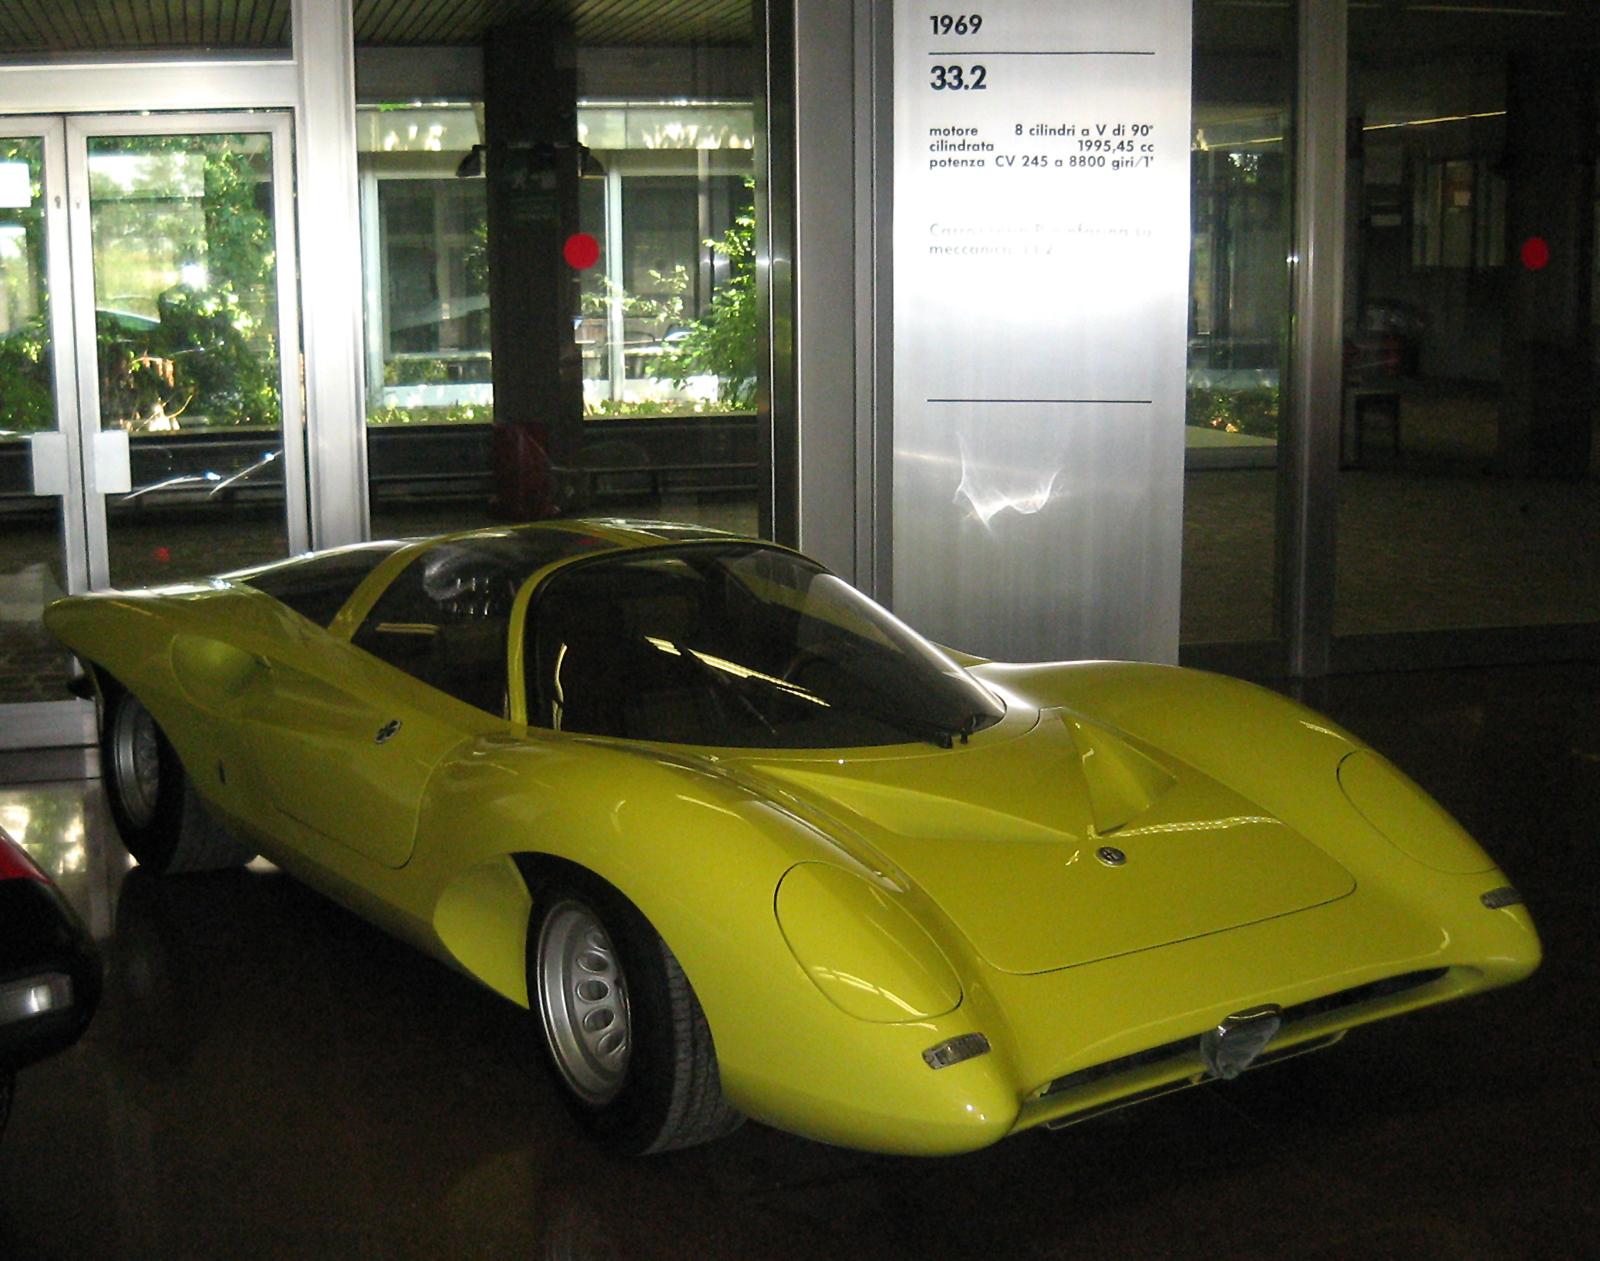 http://upload.wikimedia.org/wikipedia/commons/9/91/Alfa-Romeo-33.2.jpg